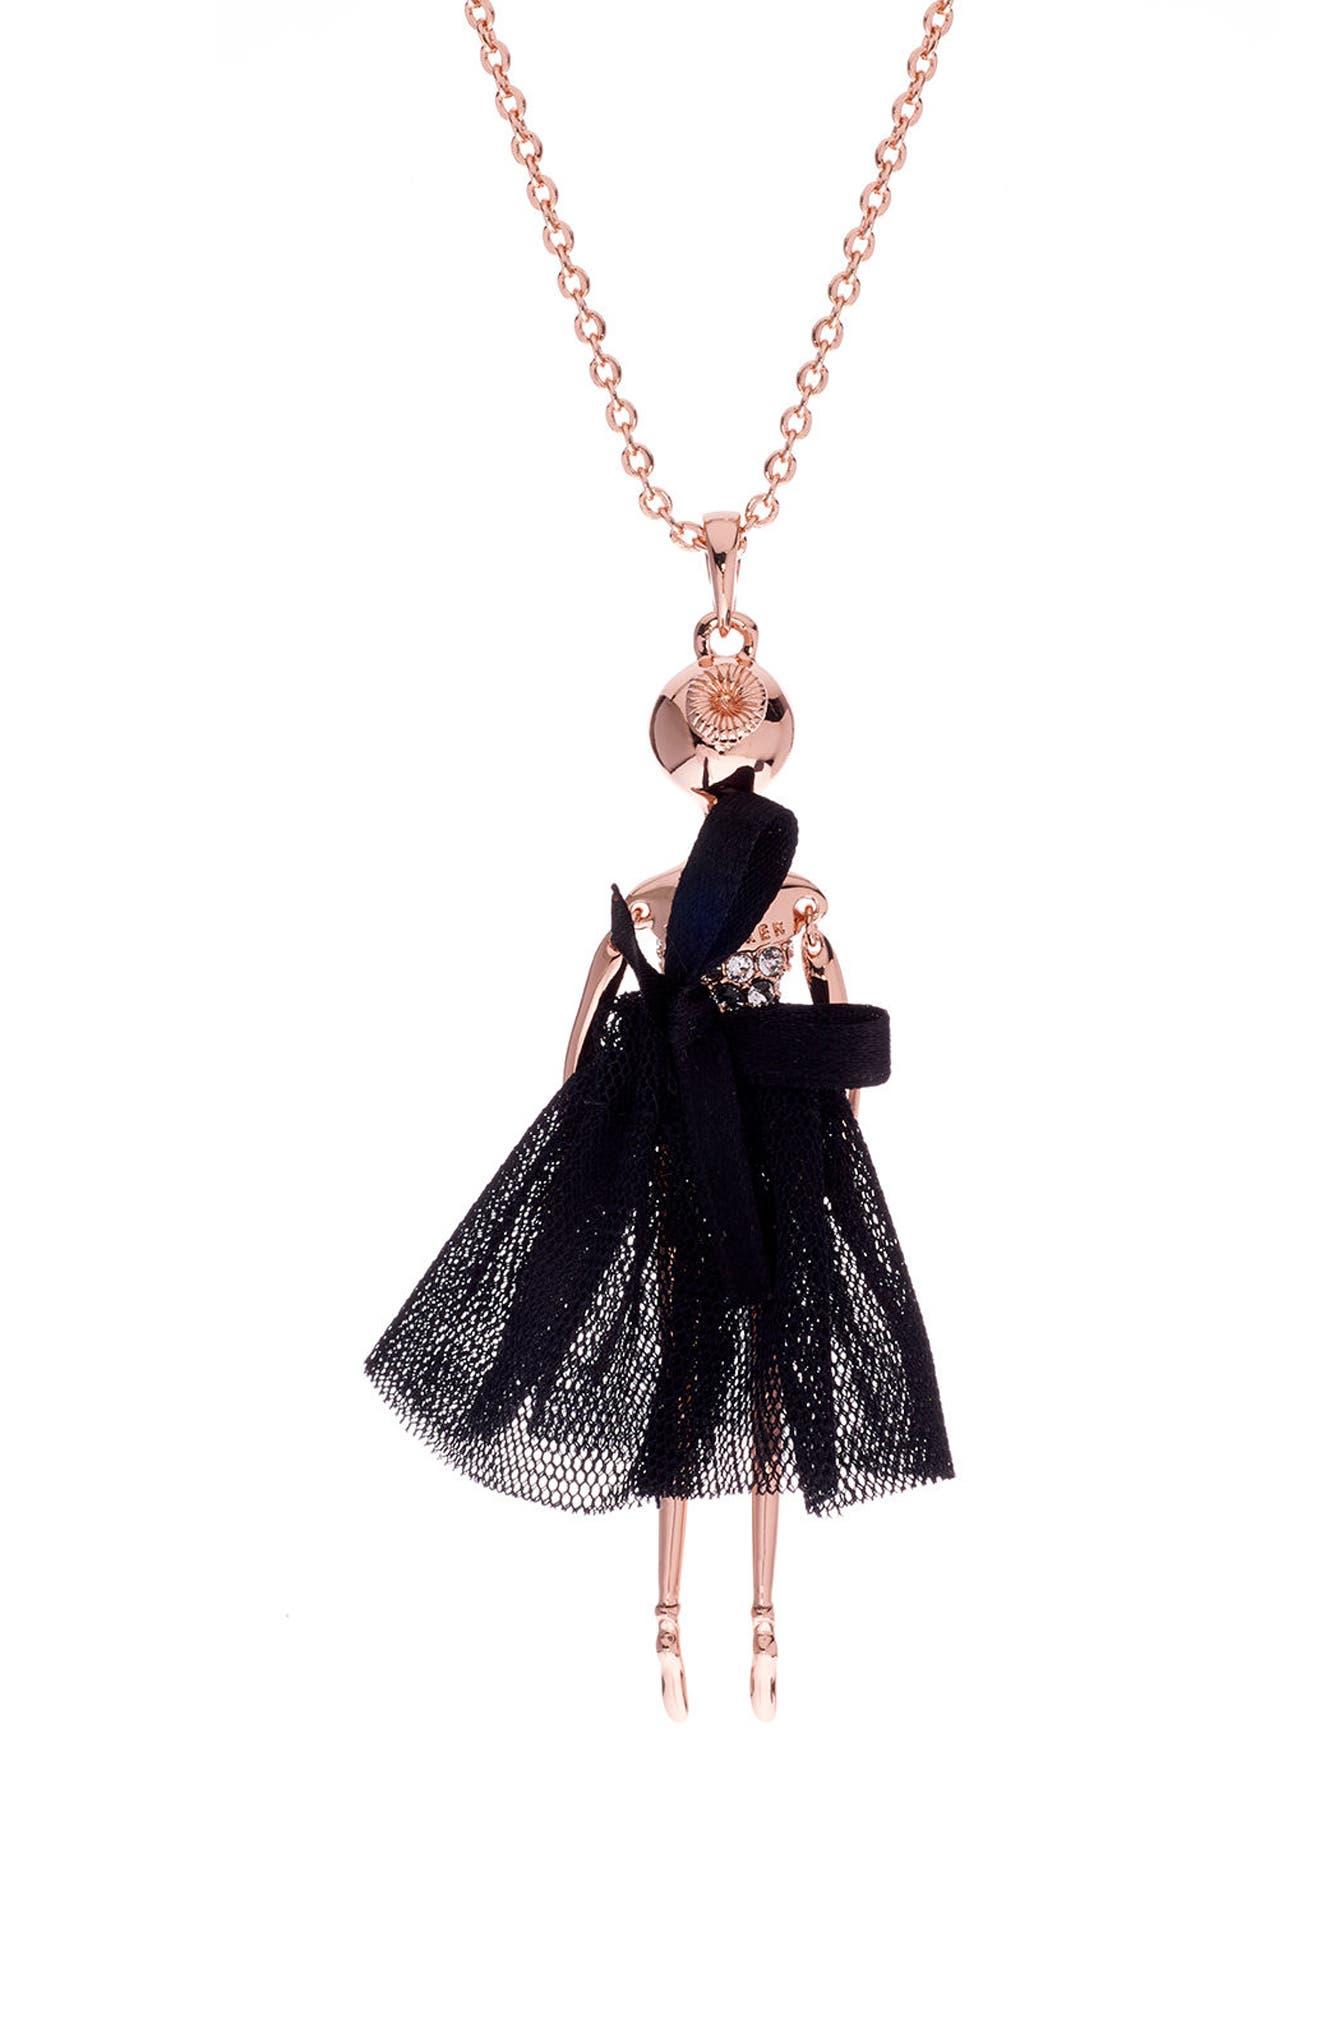 Bijou Ballerina Pendant Necklace,                             Alternate thumbnail 2, color,                             001